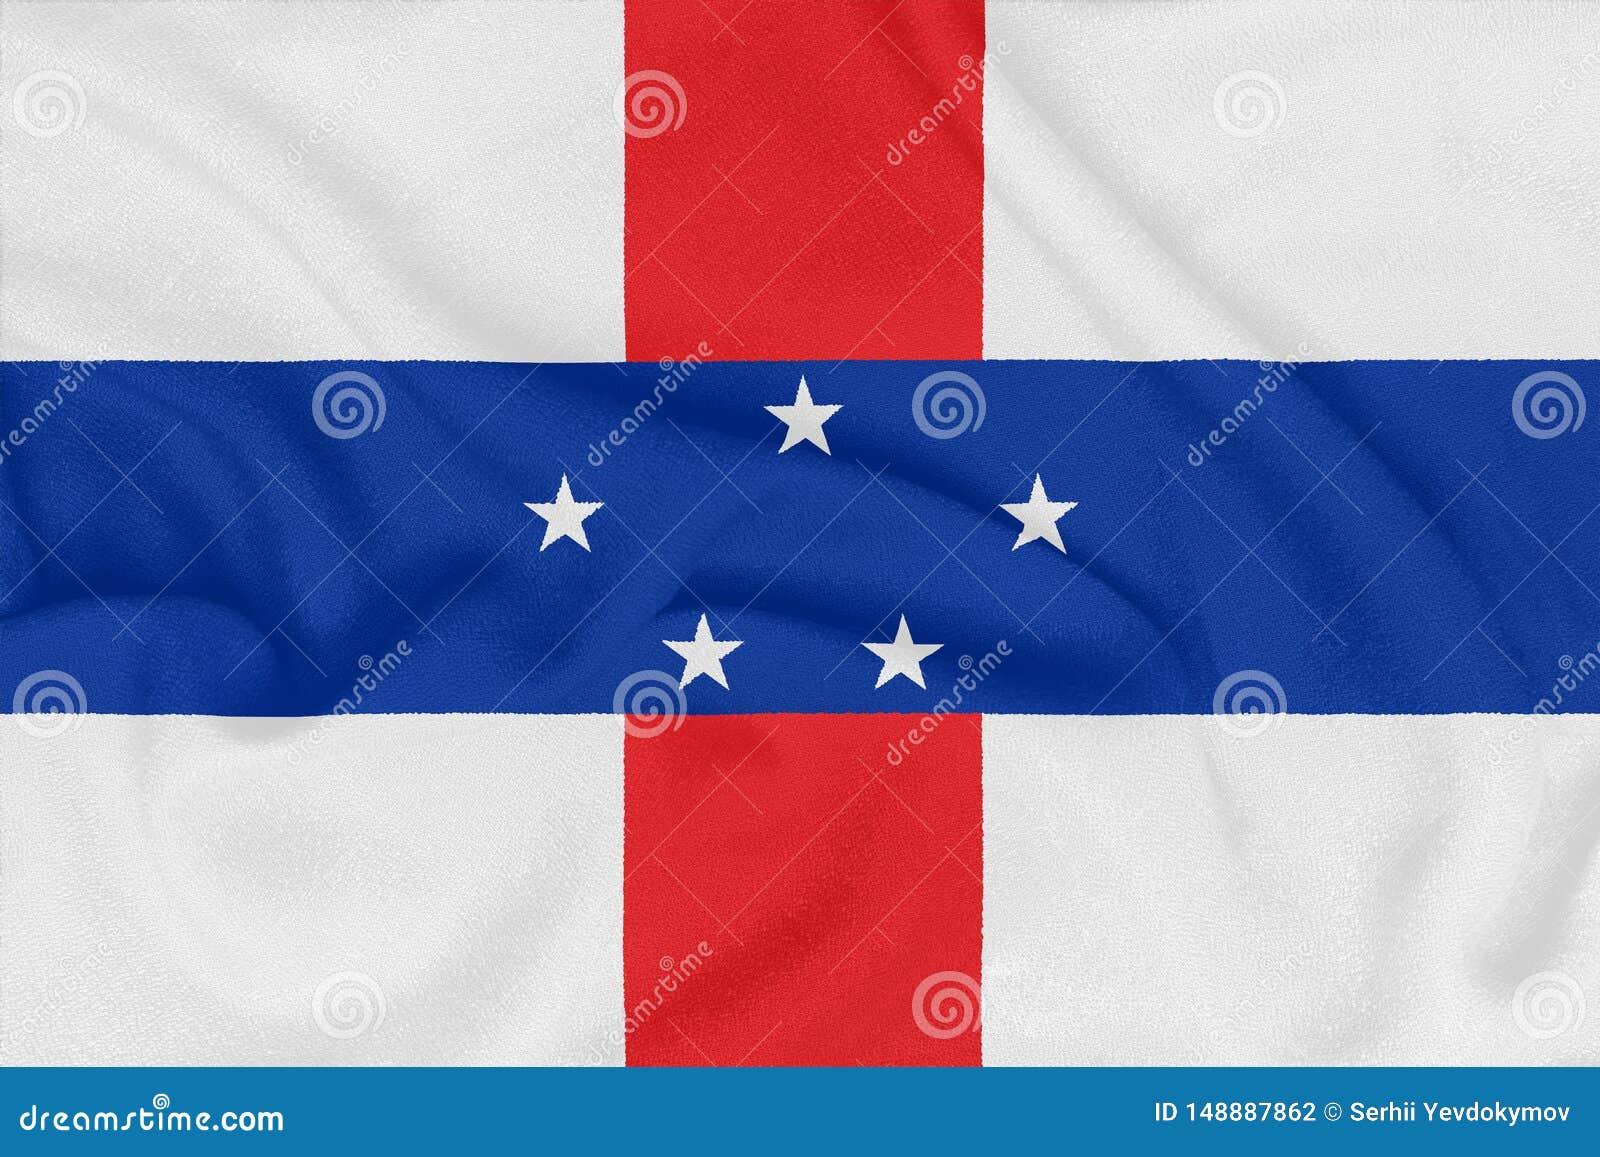 Flag of Netherlands Antilles on textured fabric. Patriotic symbol